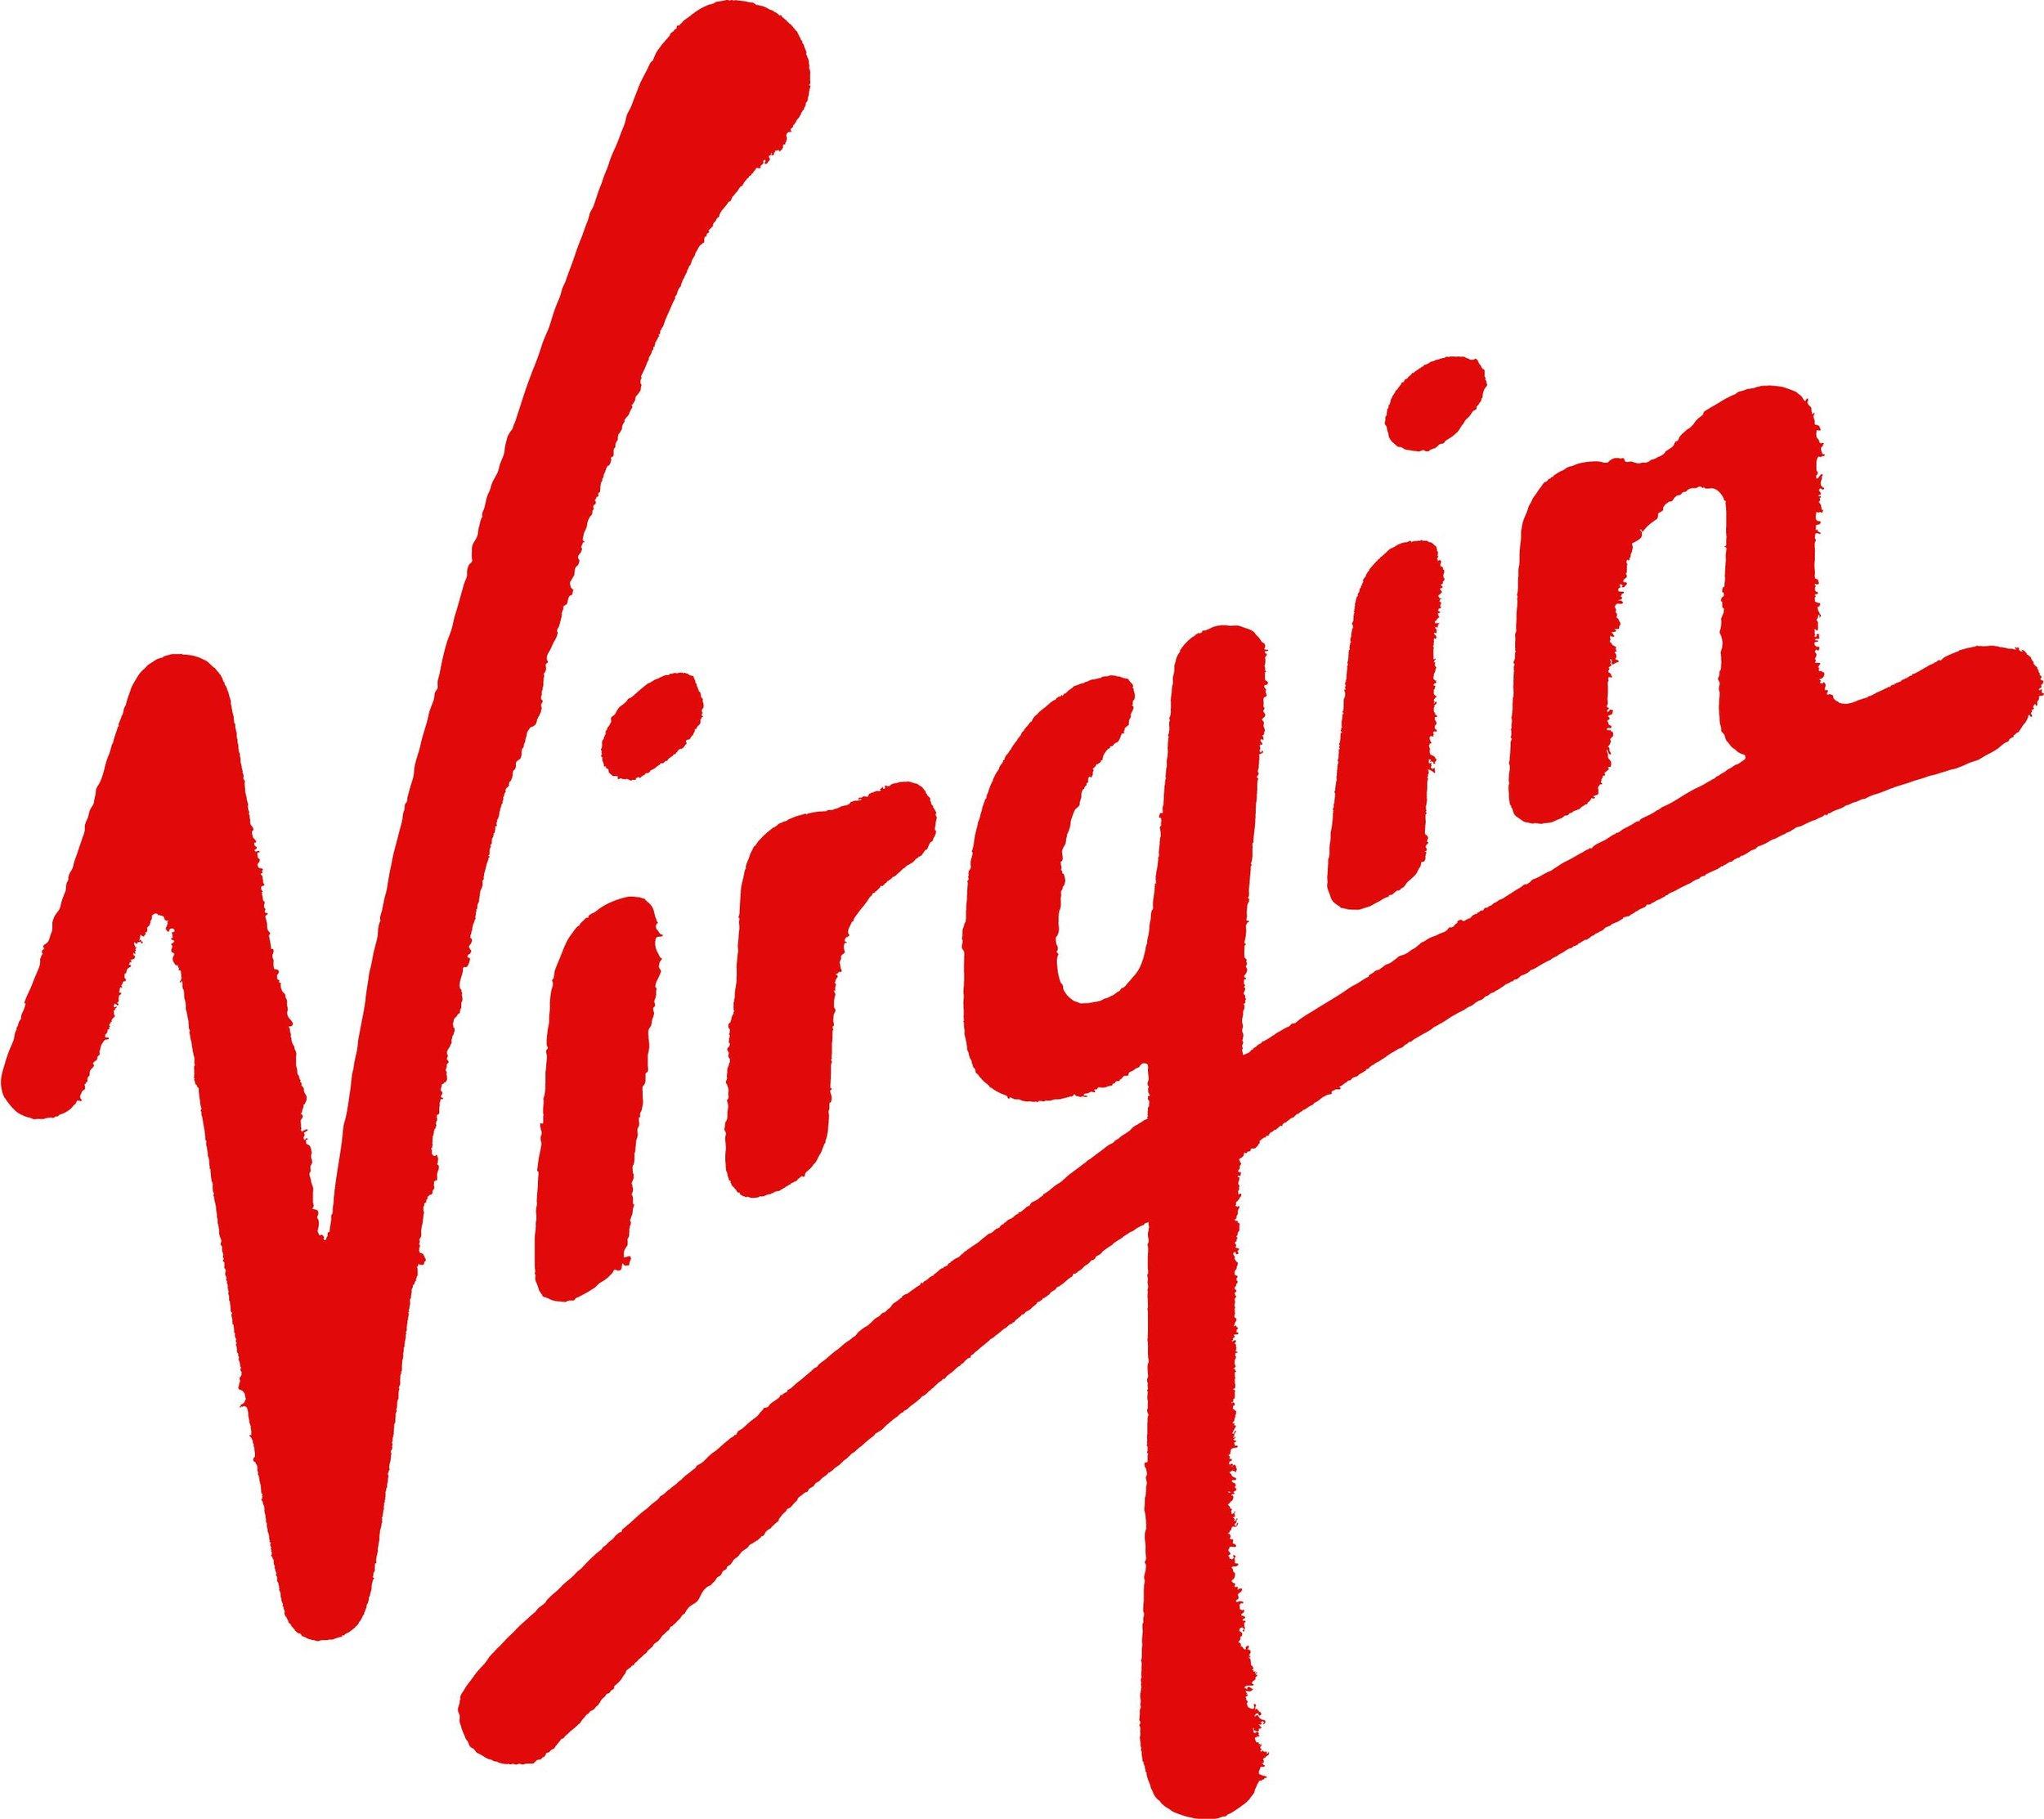 Virgin_logo.jpg